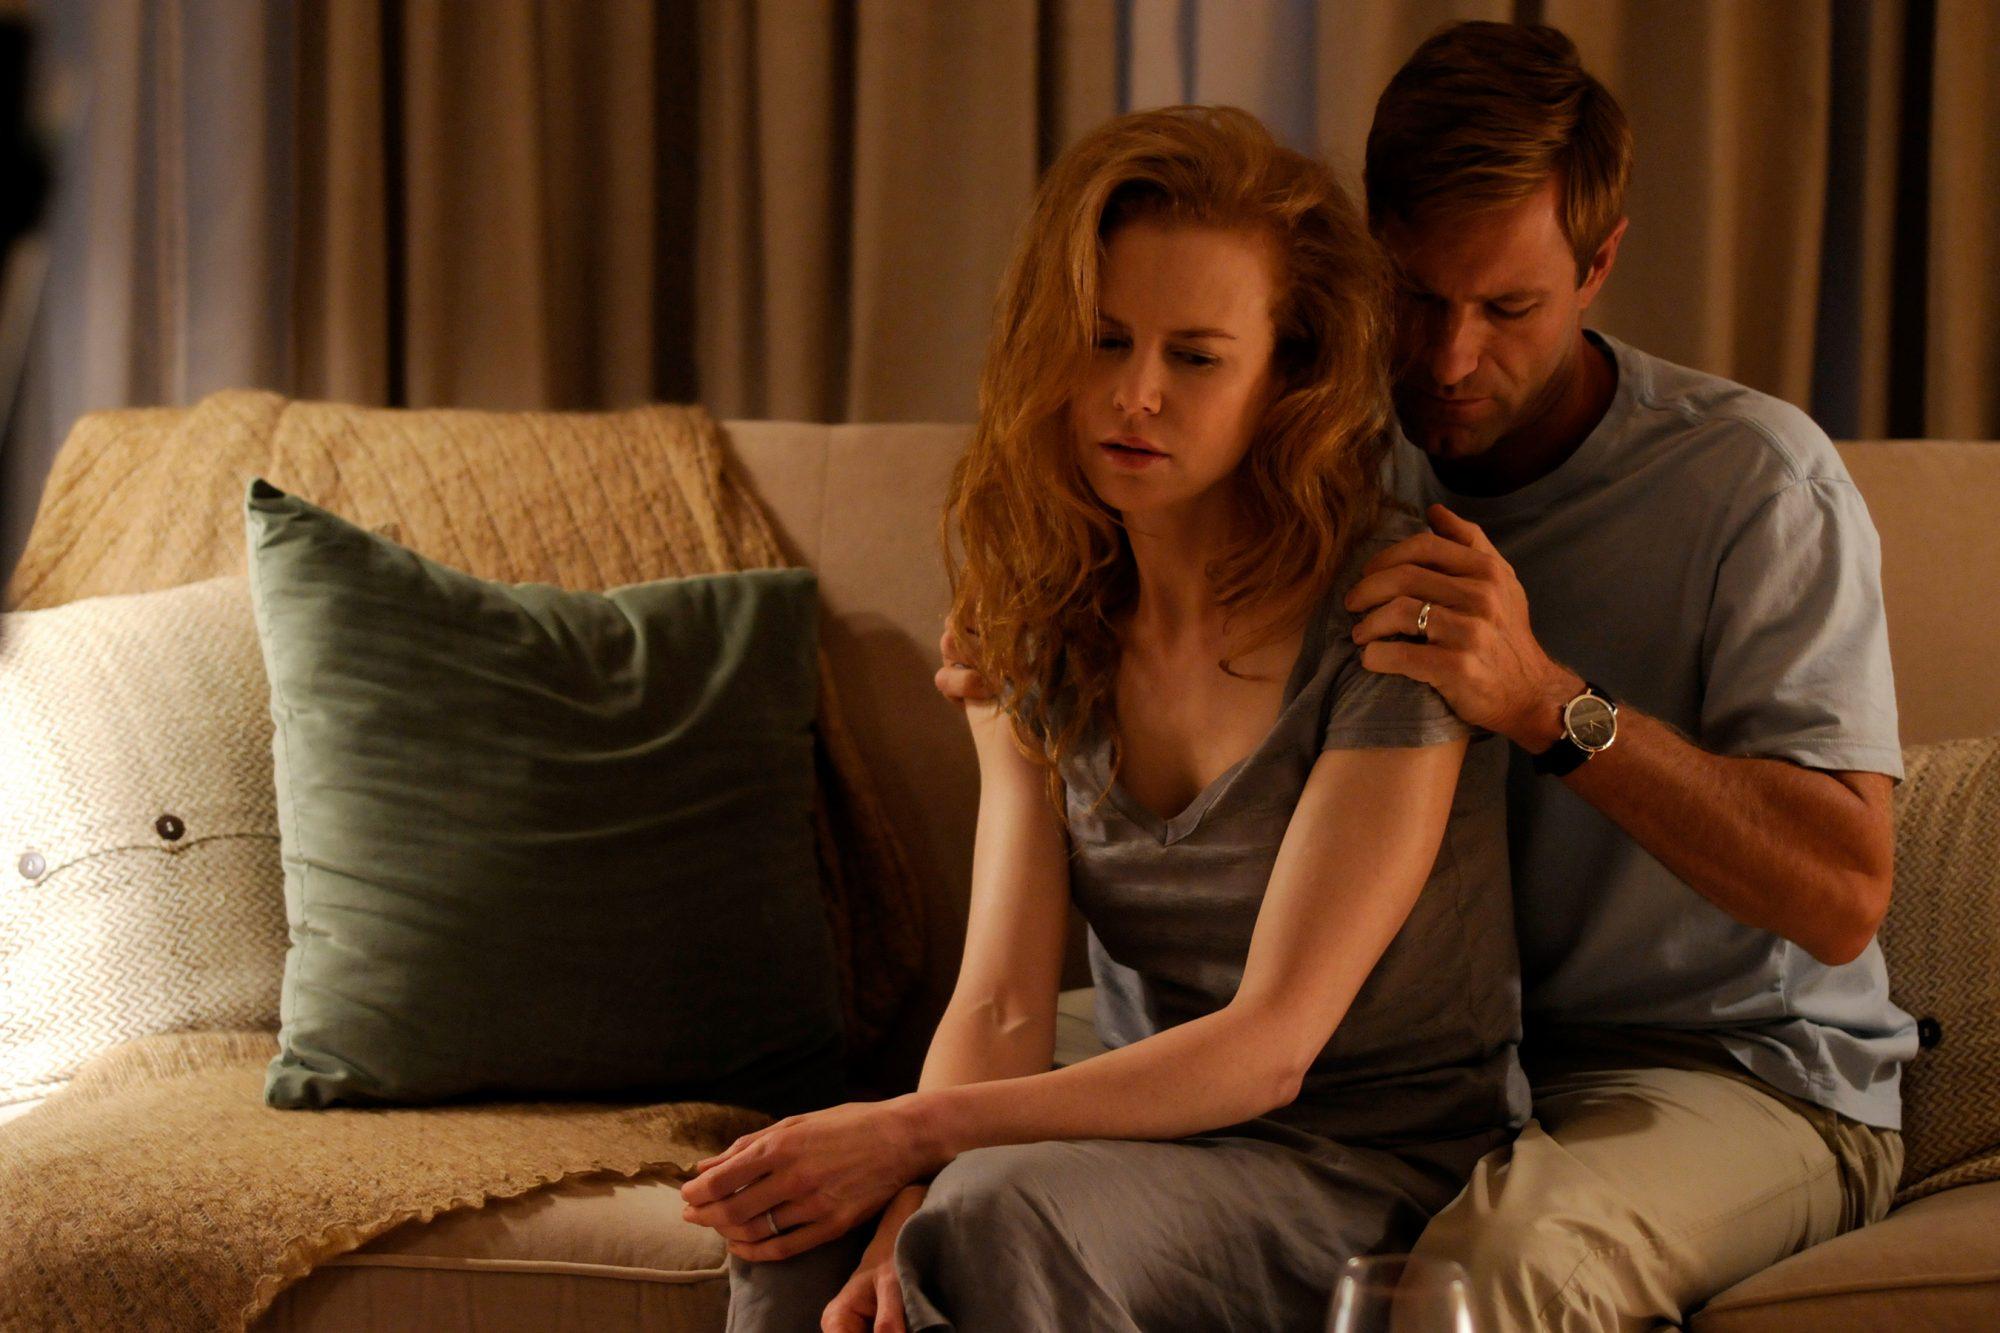 Rabbit Hole (2010)Nicole Kidman as Becca and Aaron Eckhart as Howie